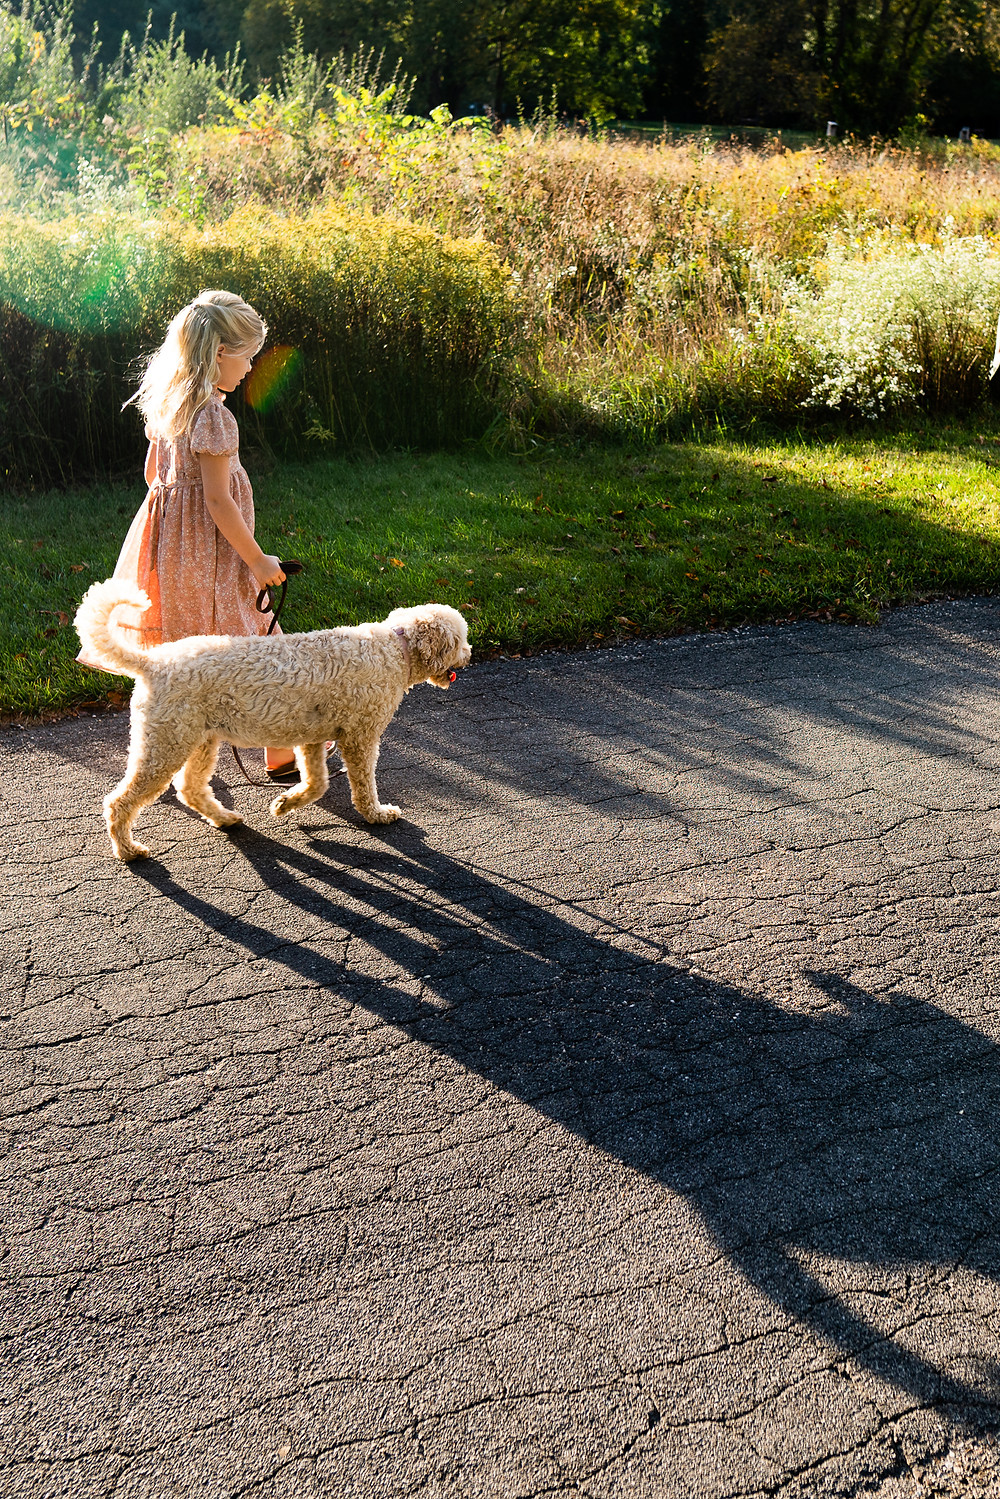 Young girl wearing a dress walking her dog outdoors